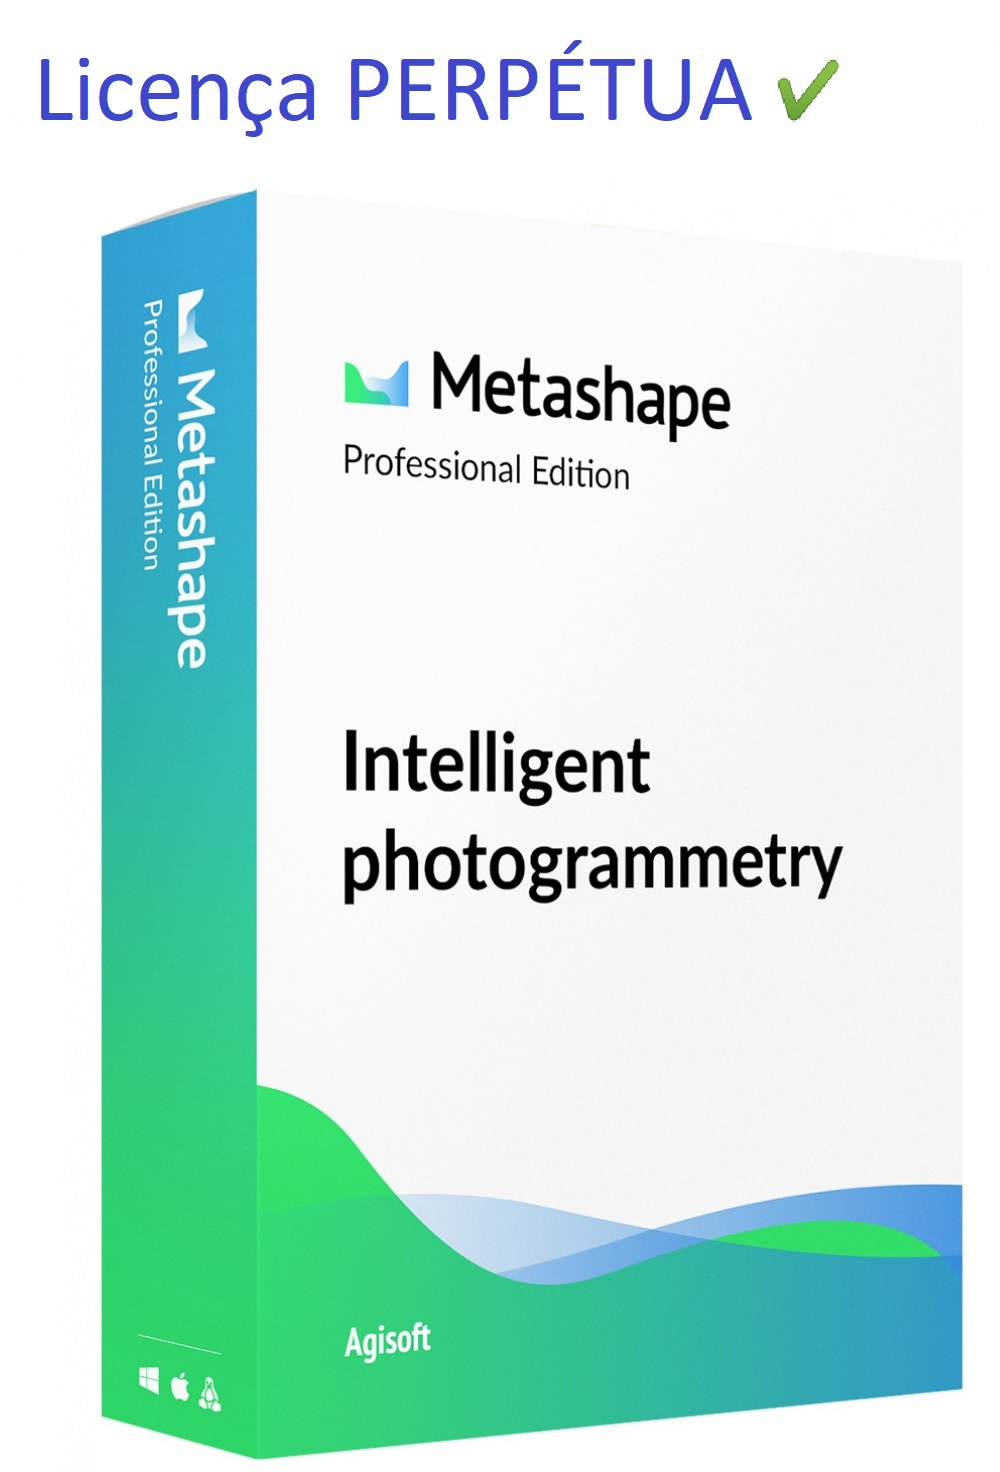 Agisoft Metashape Professional Edition (Licença Perpétua)